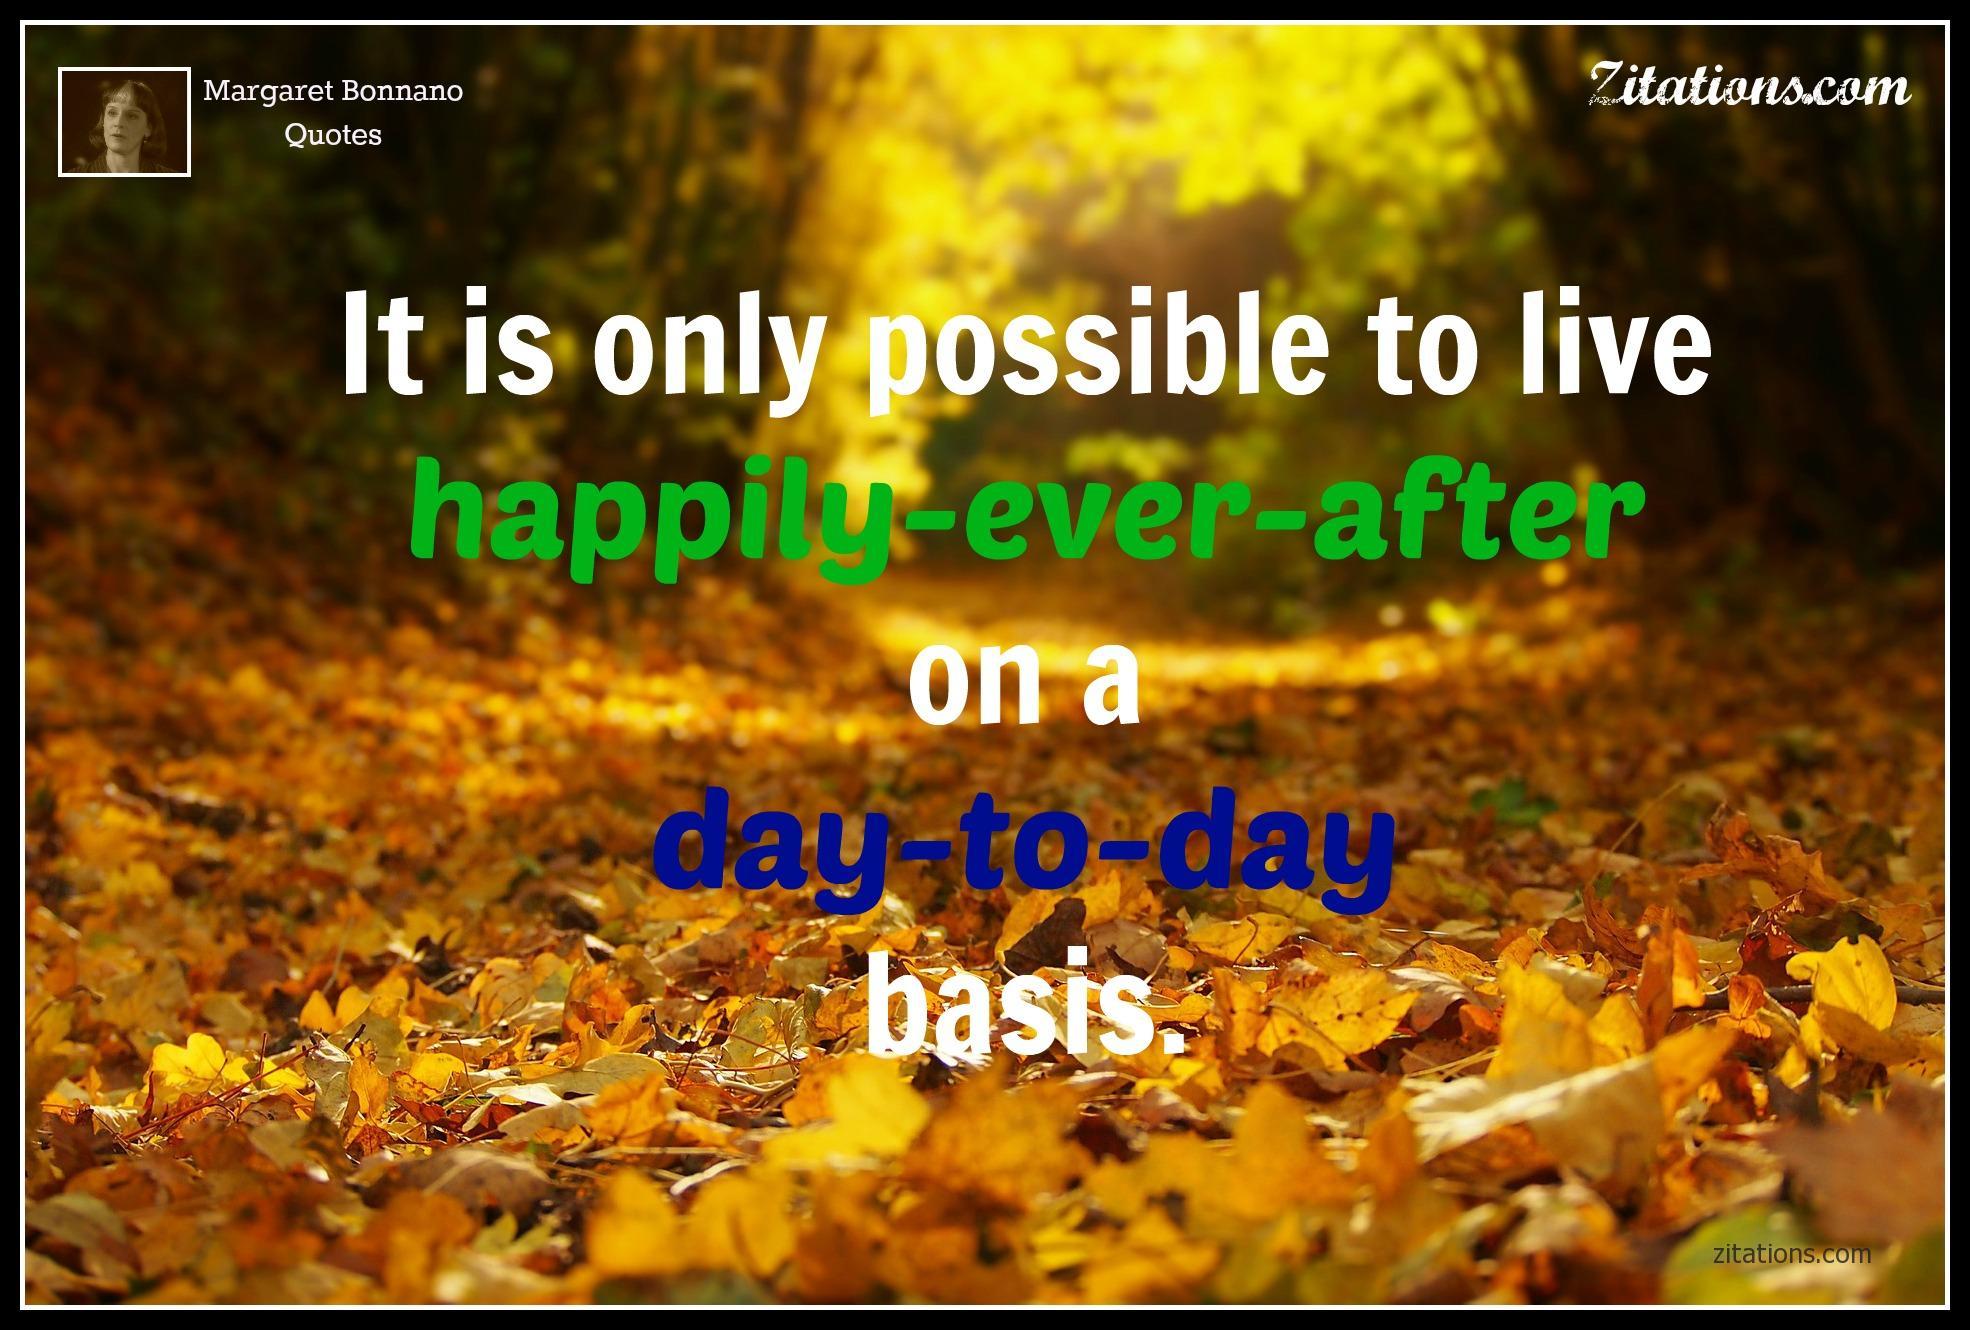 happiest moment quotes - Margaret Bonnano Quotes